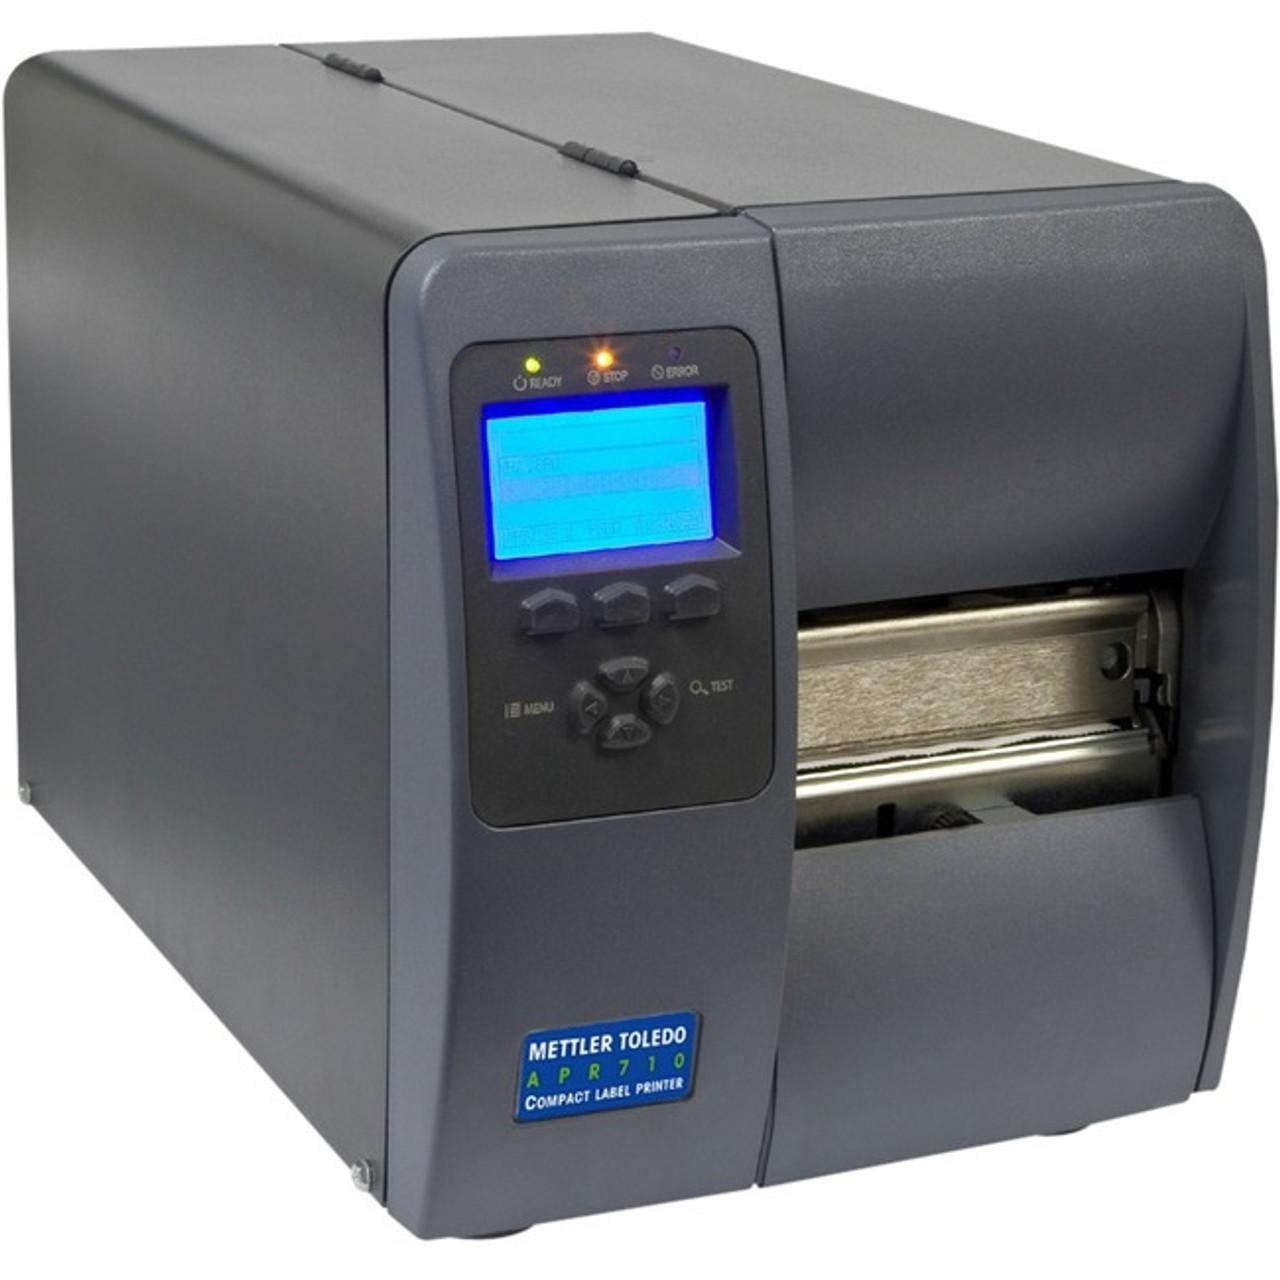 Mettler Toledo APR710 Desktop Direct Thermal/Thermal Transfer Label Printer - 64068861